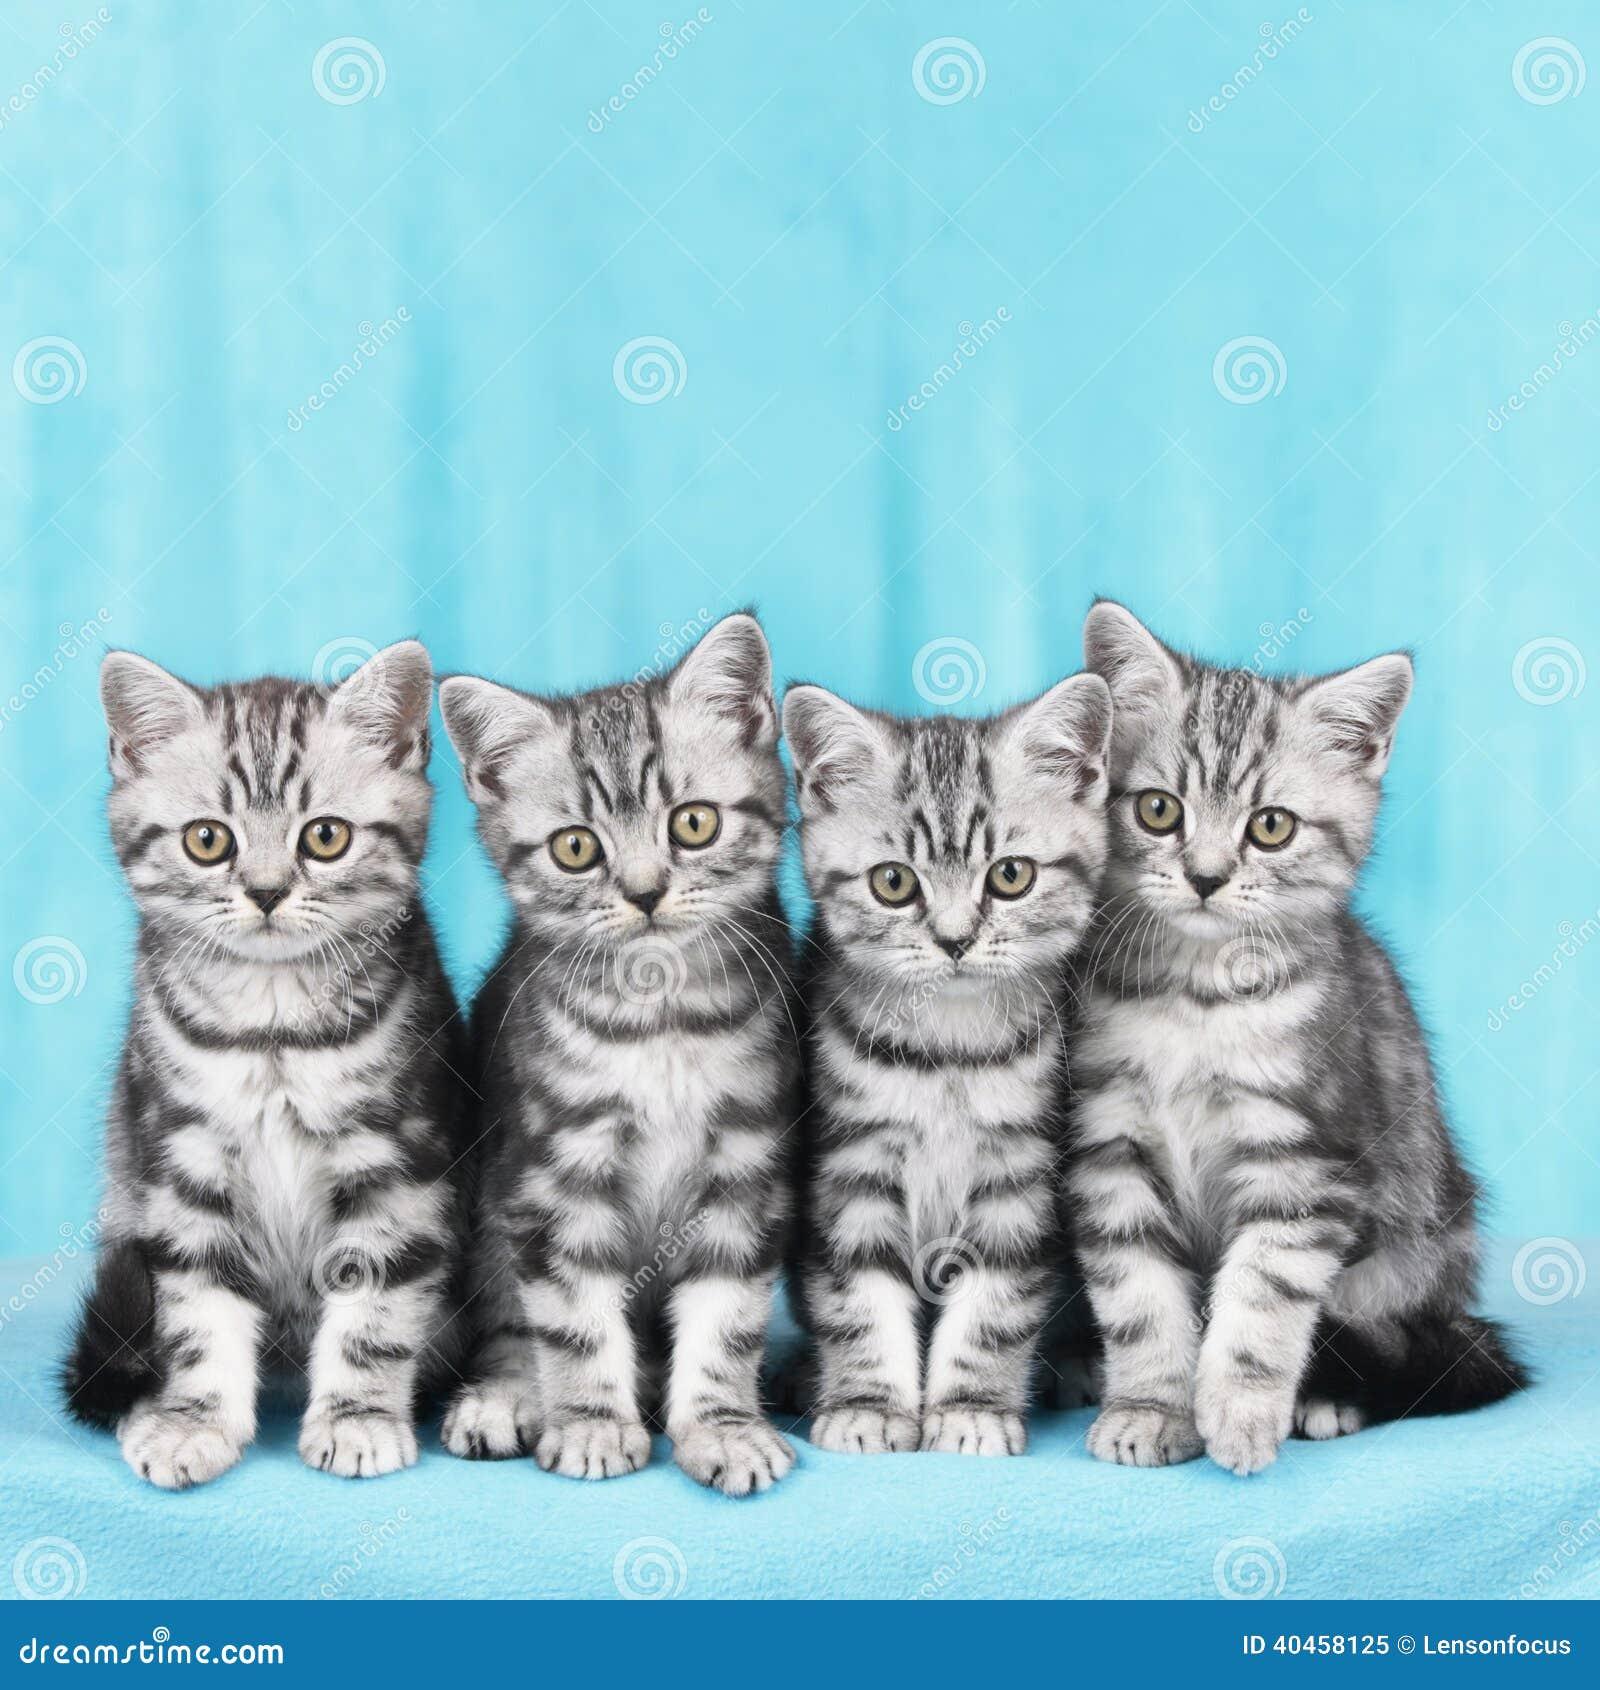 Four kitten in a row stock image. Image of kitten, tabby ...